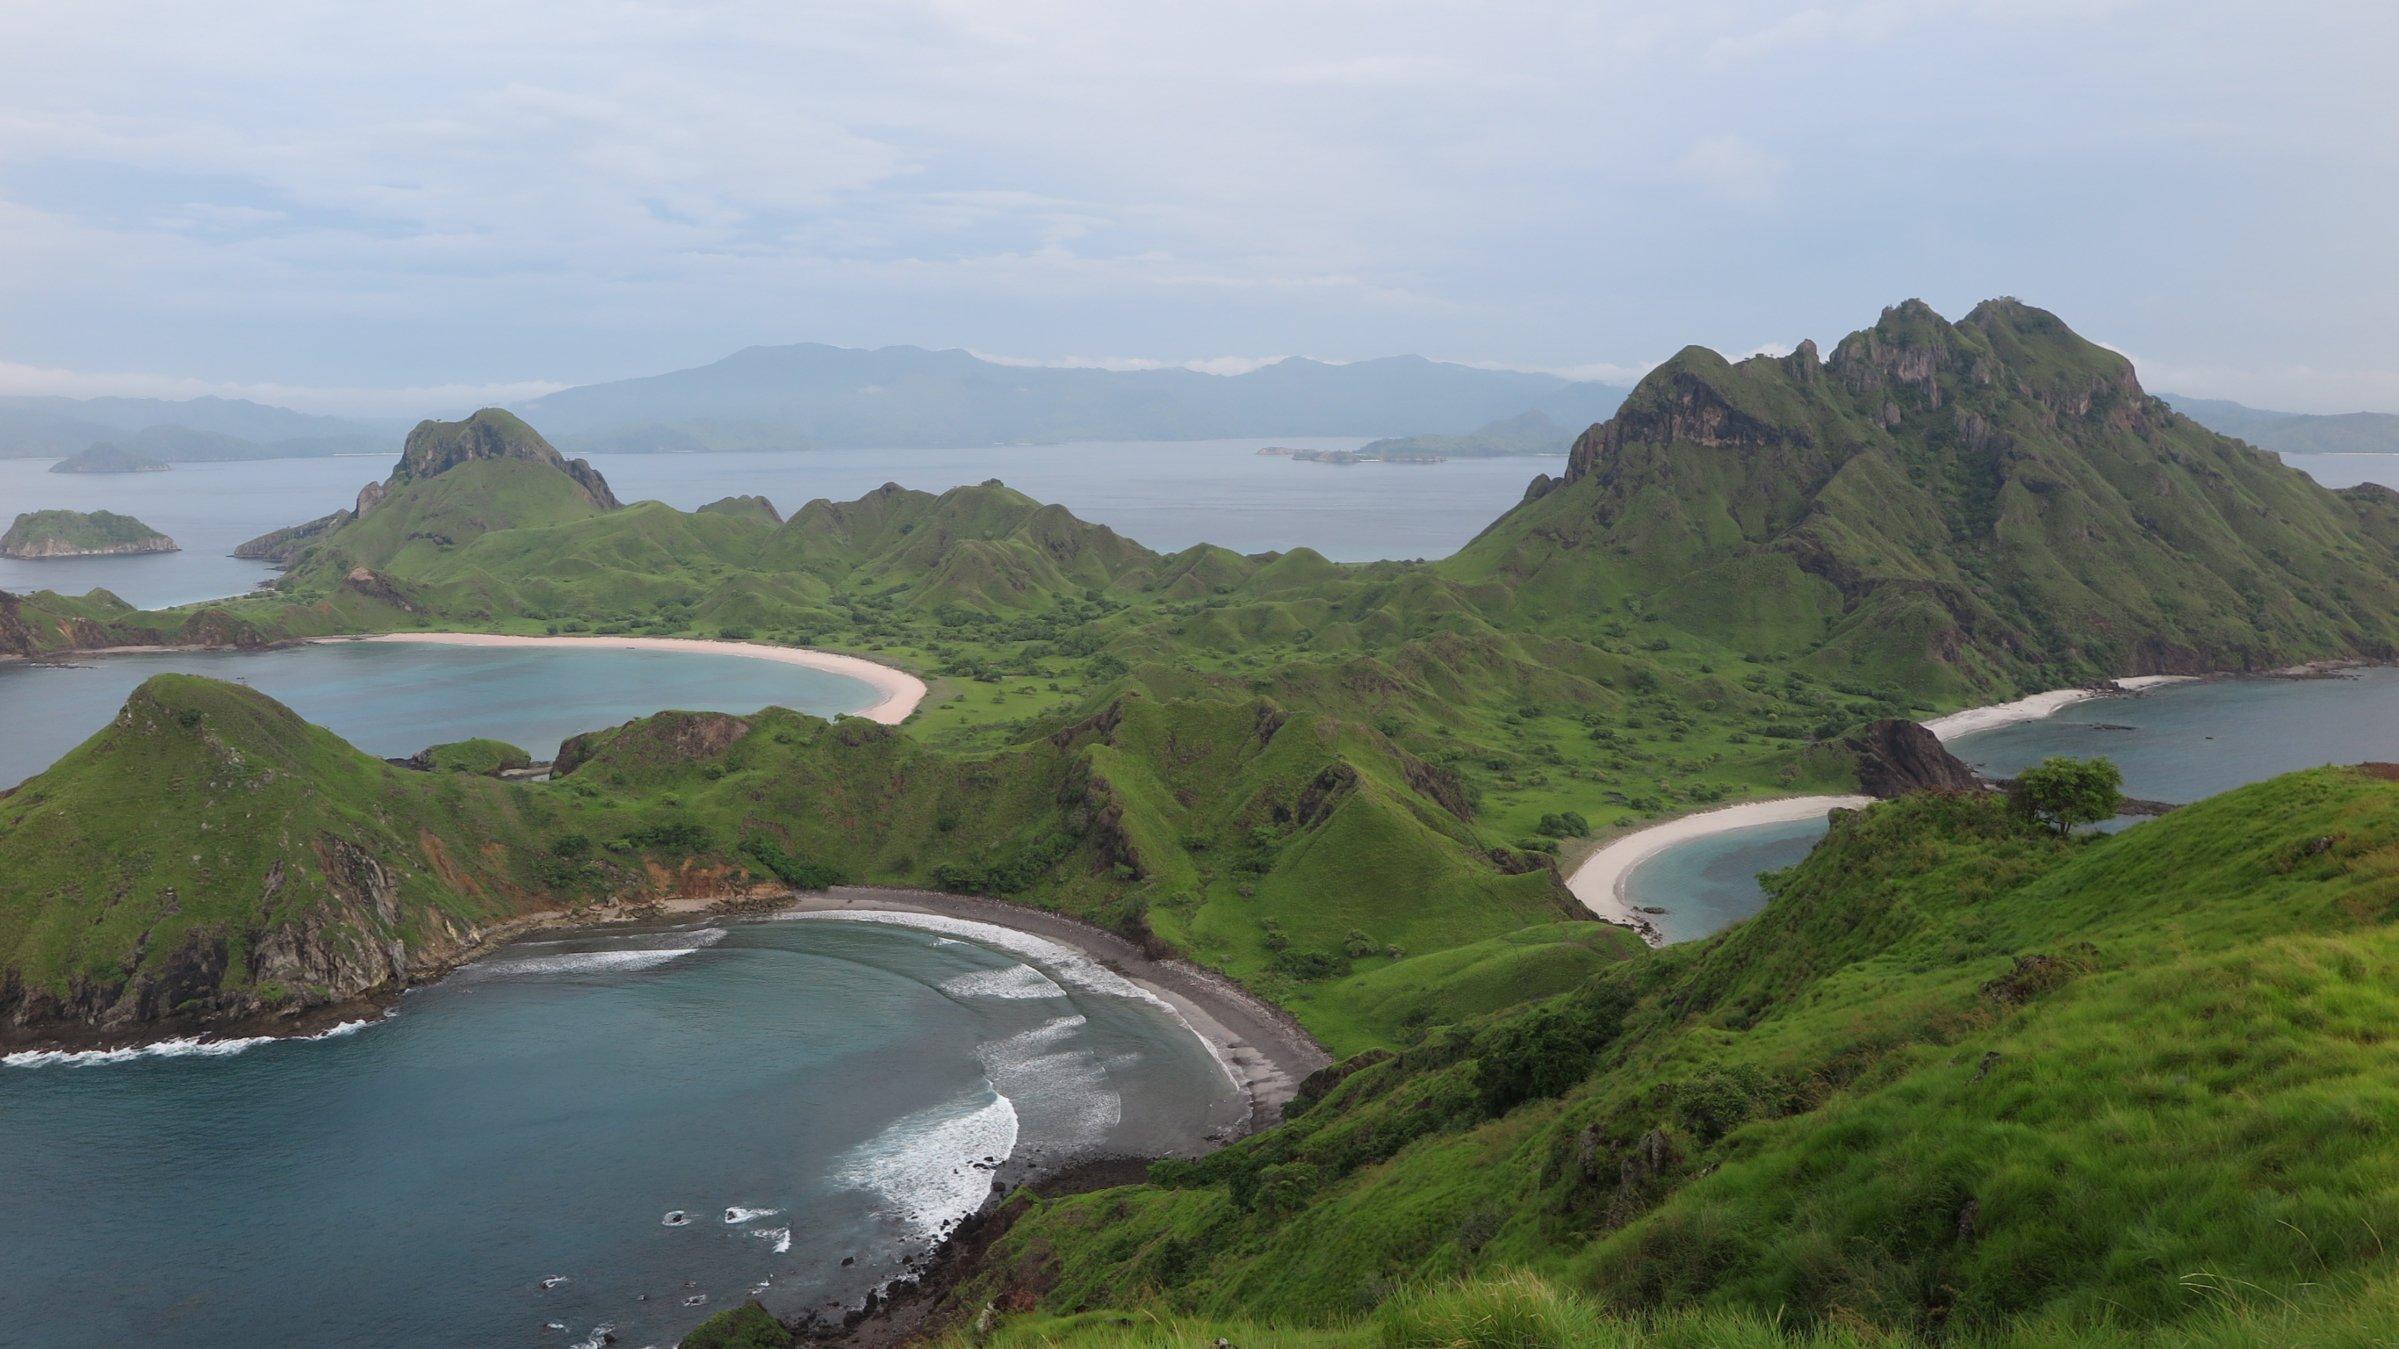 6-Day Flores to Komodo Island Tour - Indonesia Itinerary